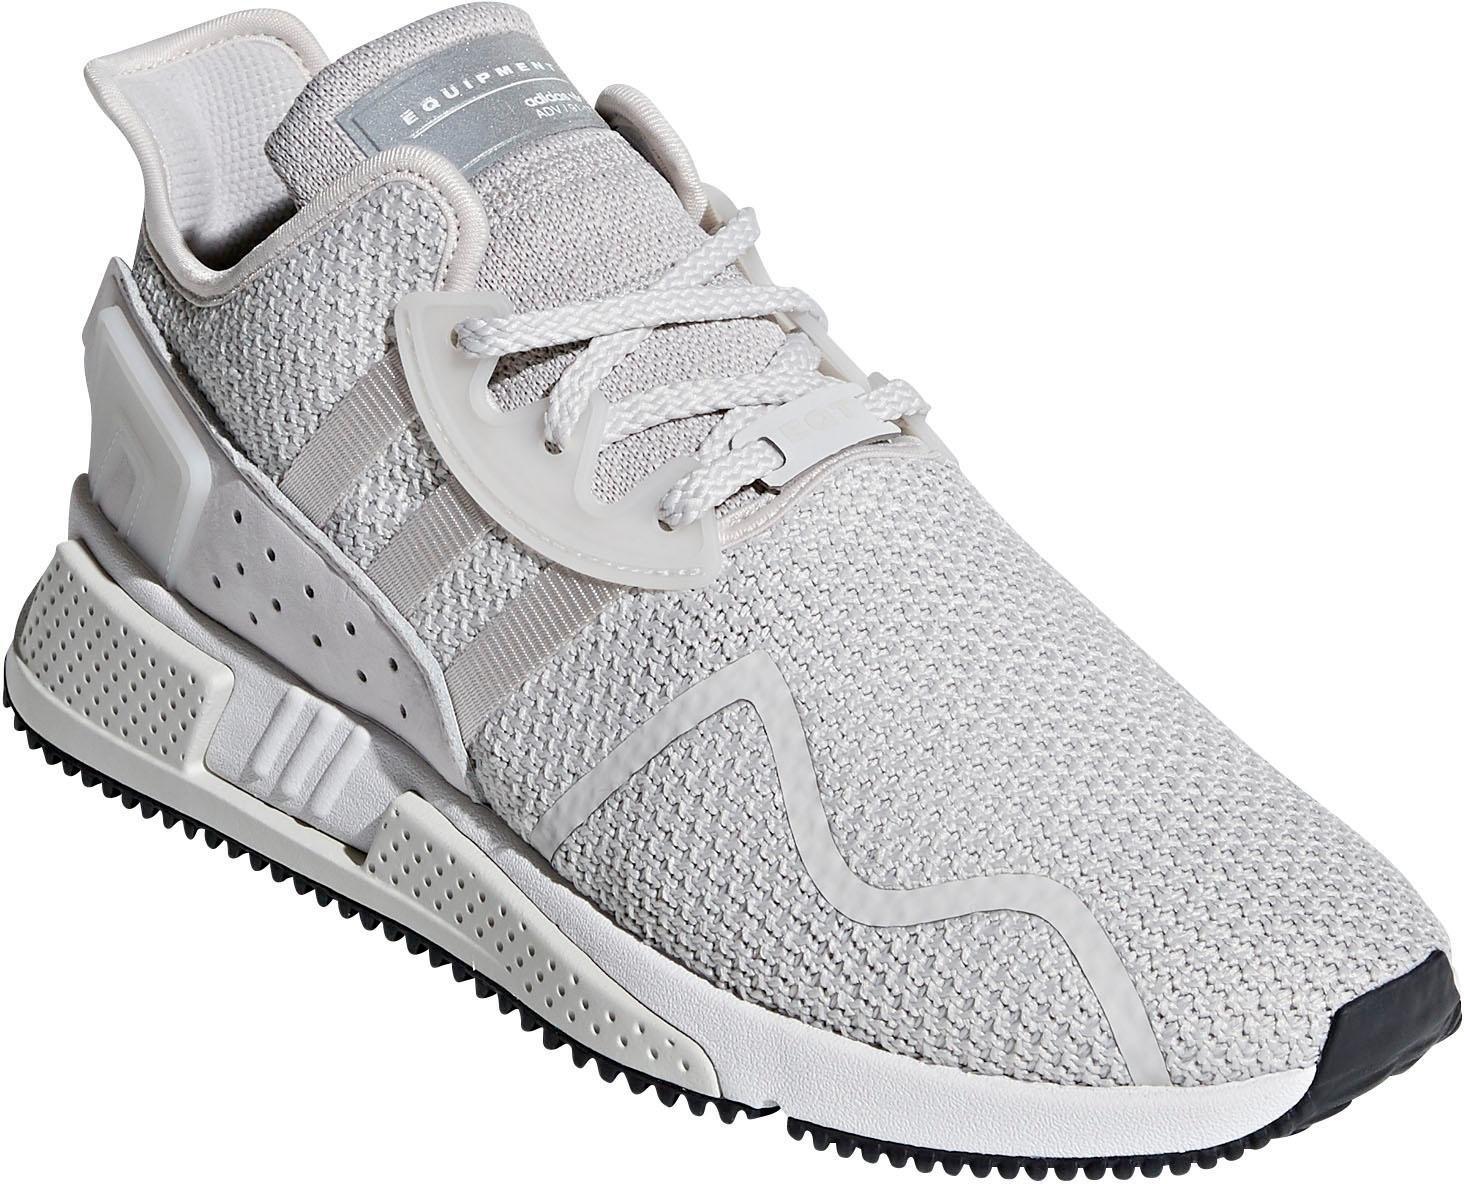 pretty nice 29d56 21435 Afbeeldingsbron adidas Originals sneakers »EQT CUSHION ADV«